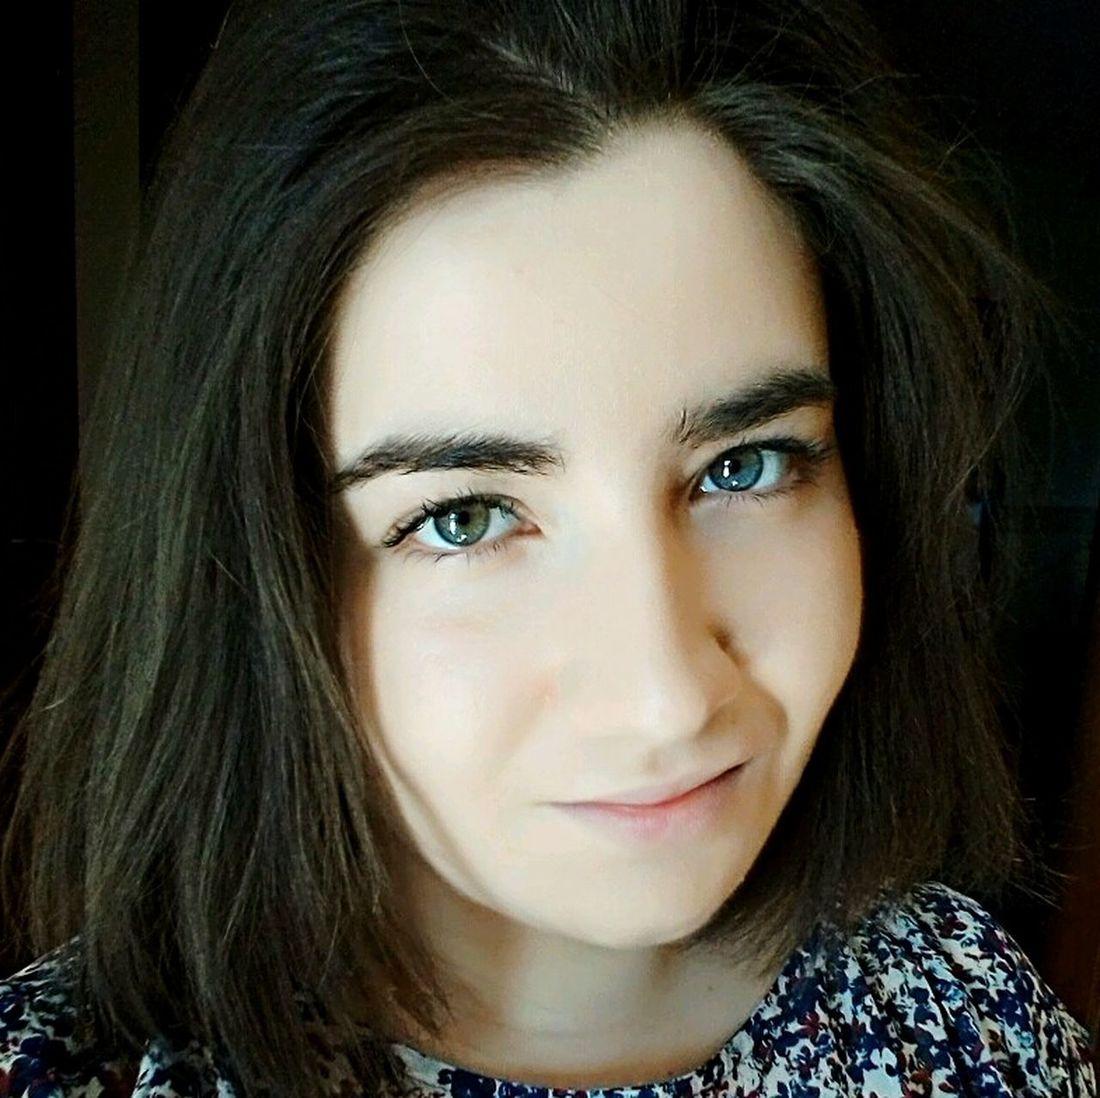 Portrait Portrait Of A Woman Me Selfie ✌ Self Portrait Selca Brunette Eyes Bicoloredeyes Girl Girls Curvy